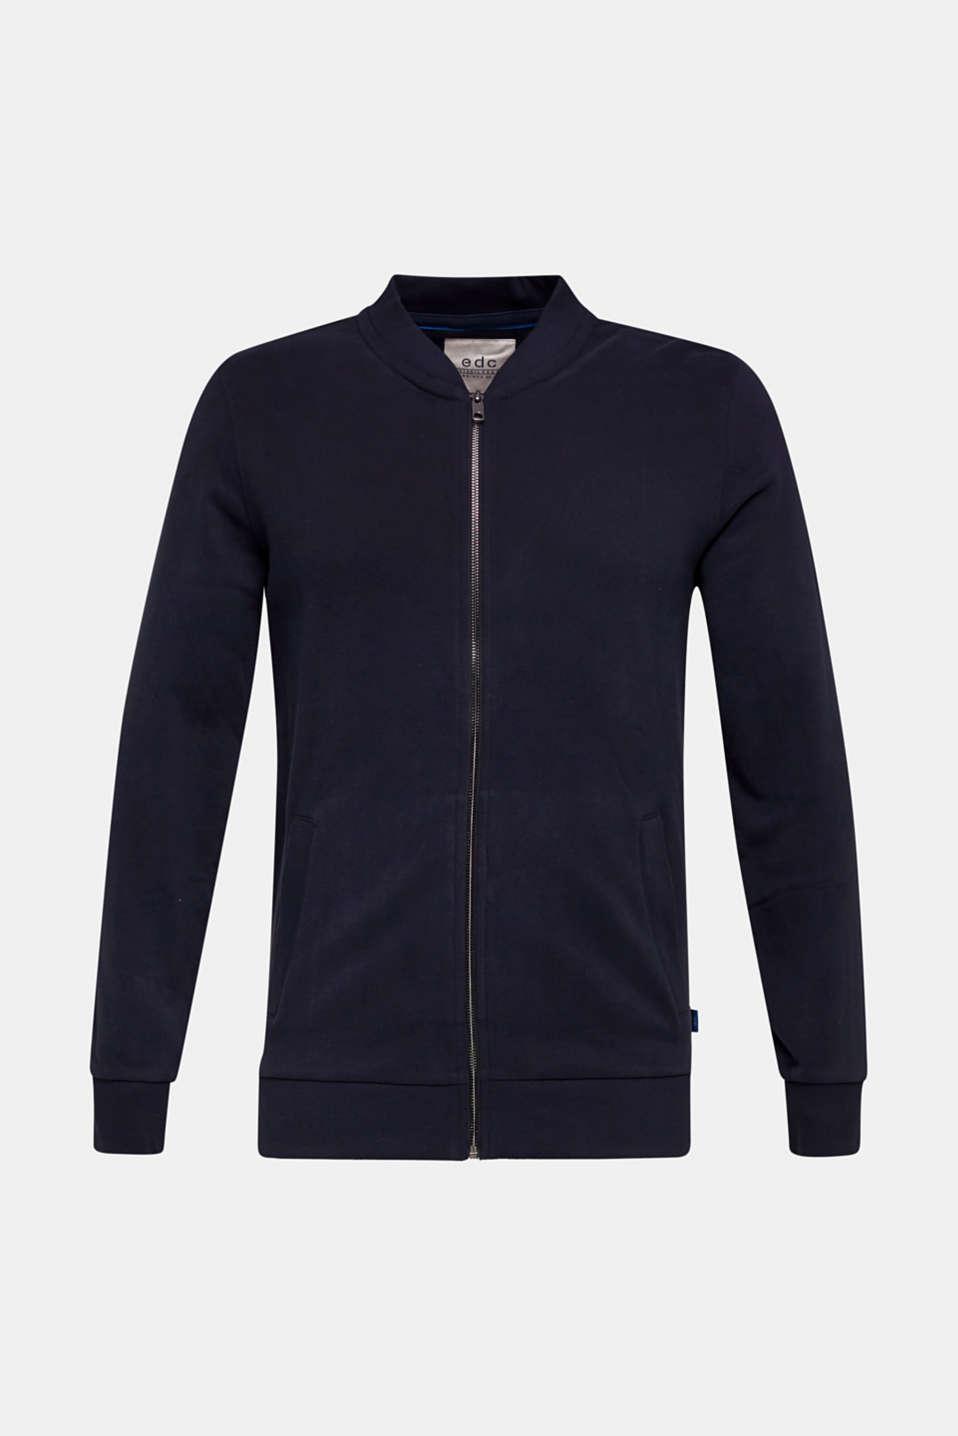 Bomber-style sweatshirt jacket, 100% cotton, NAVY, detail image number 5